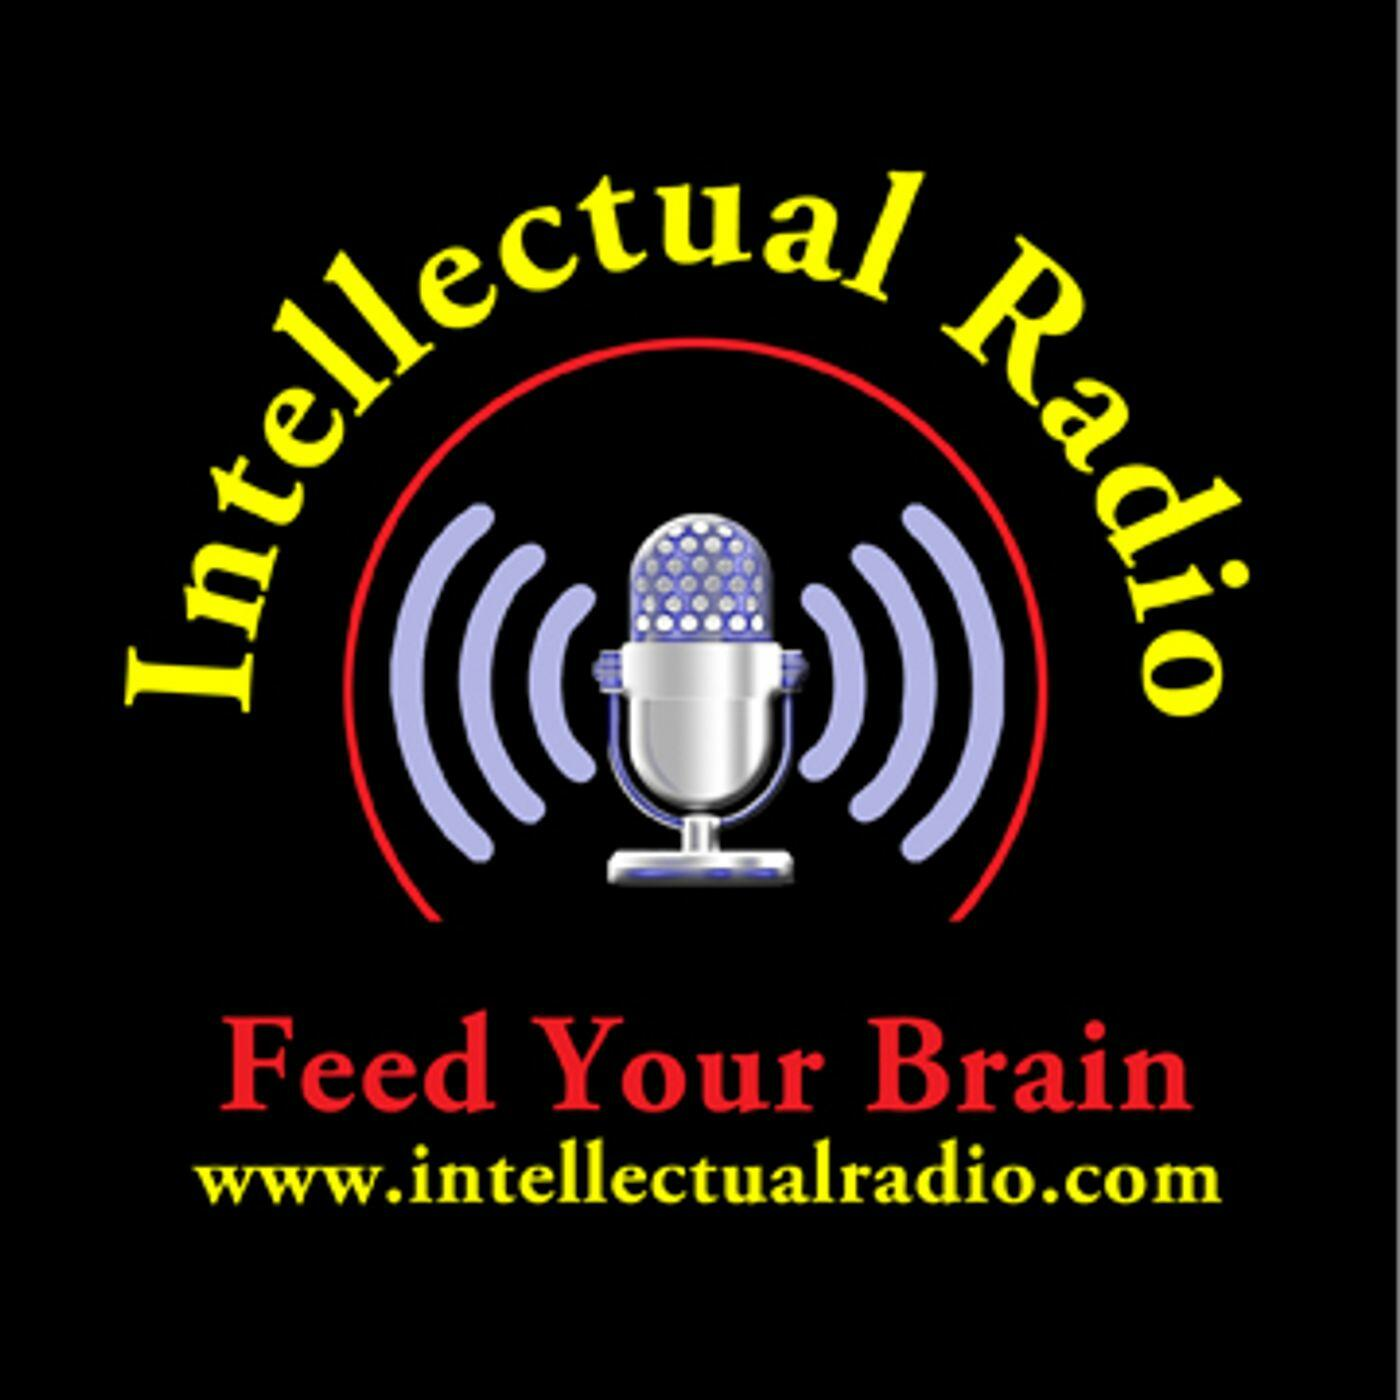 Intellectual Radio Talk